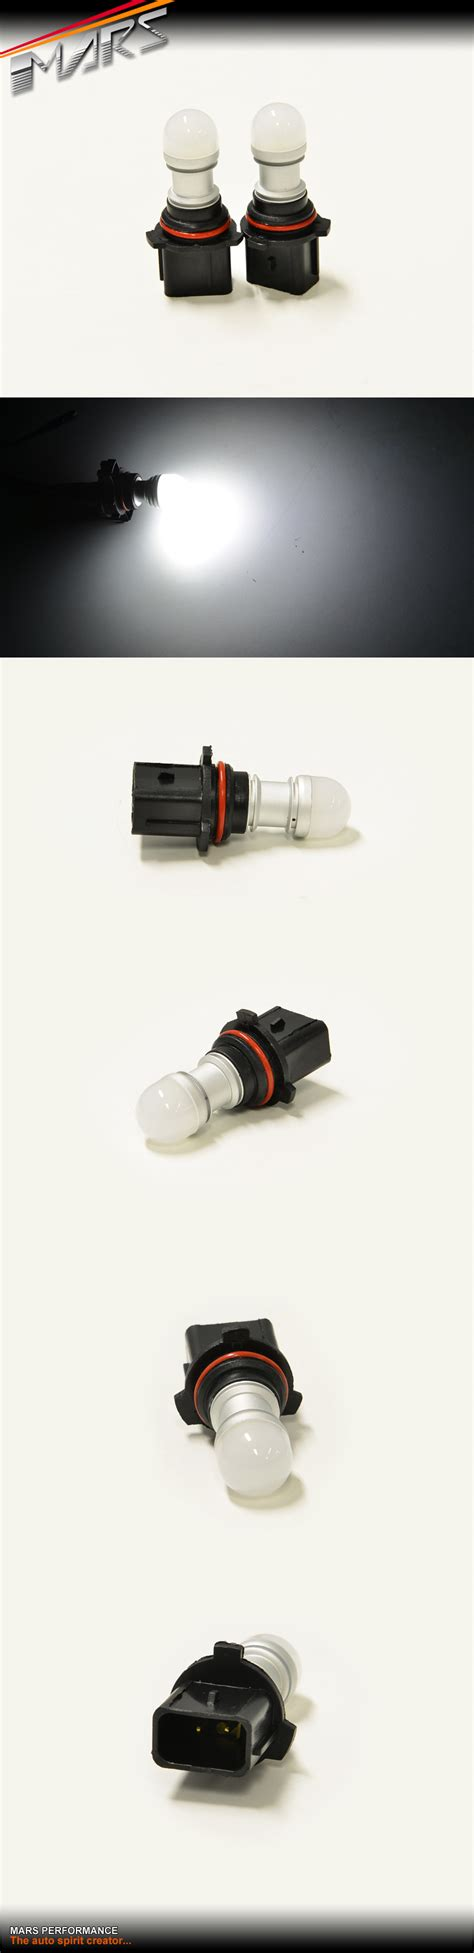 led fog light bulbs any 2x mars performance p13w 3d led smd white fog light bulbs